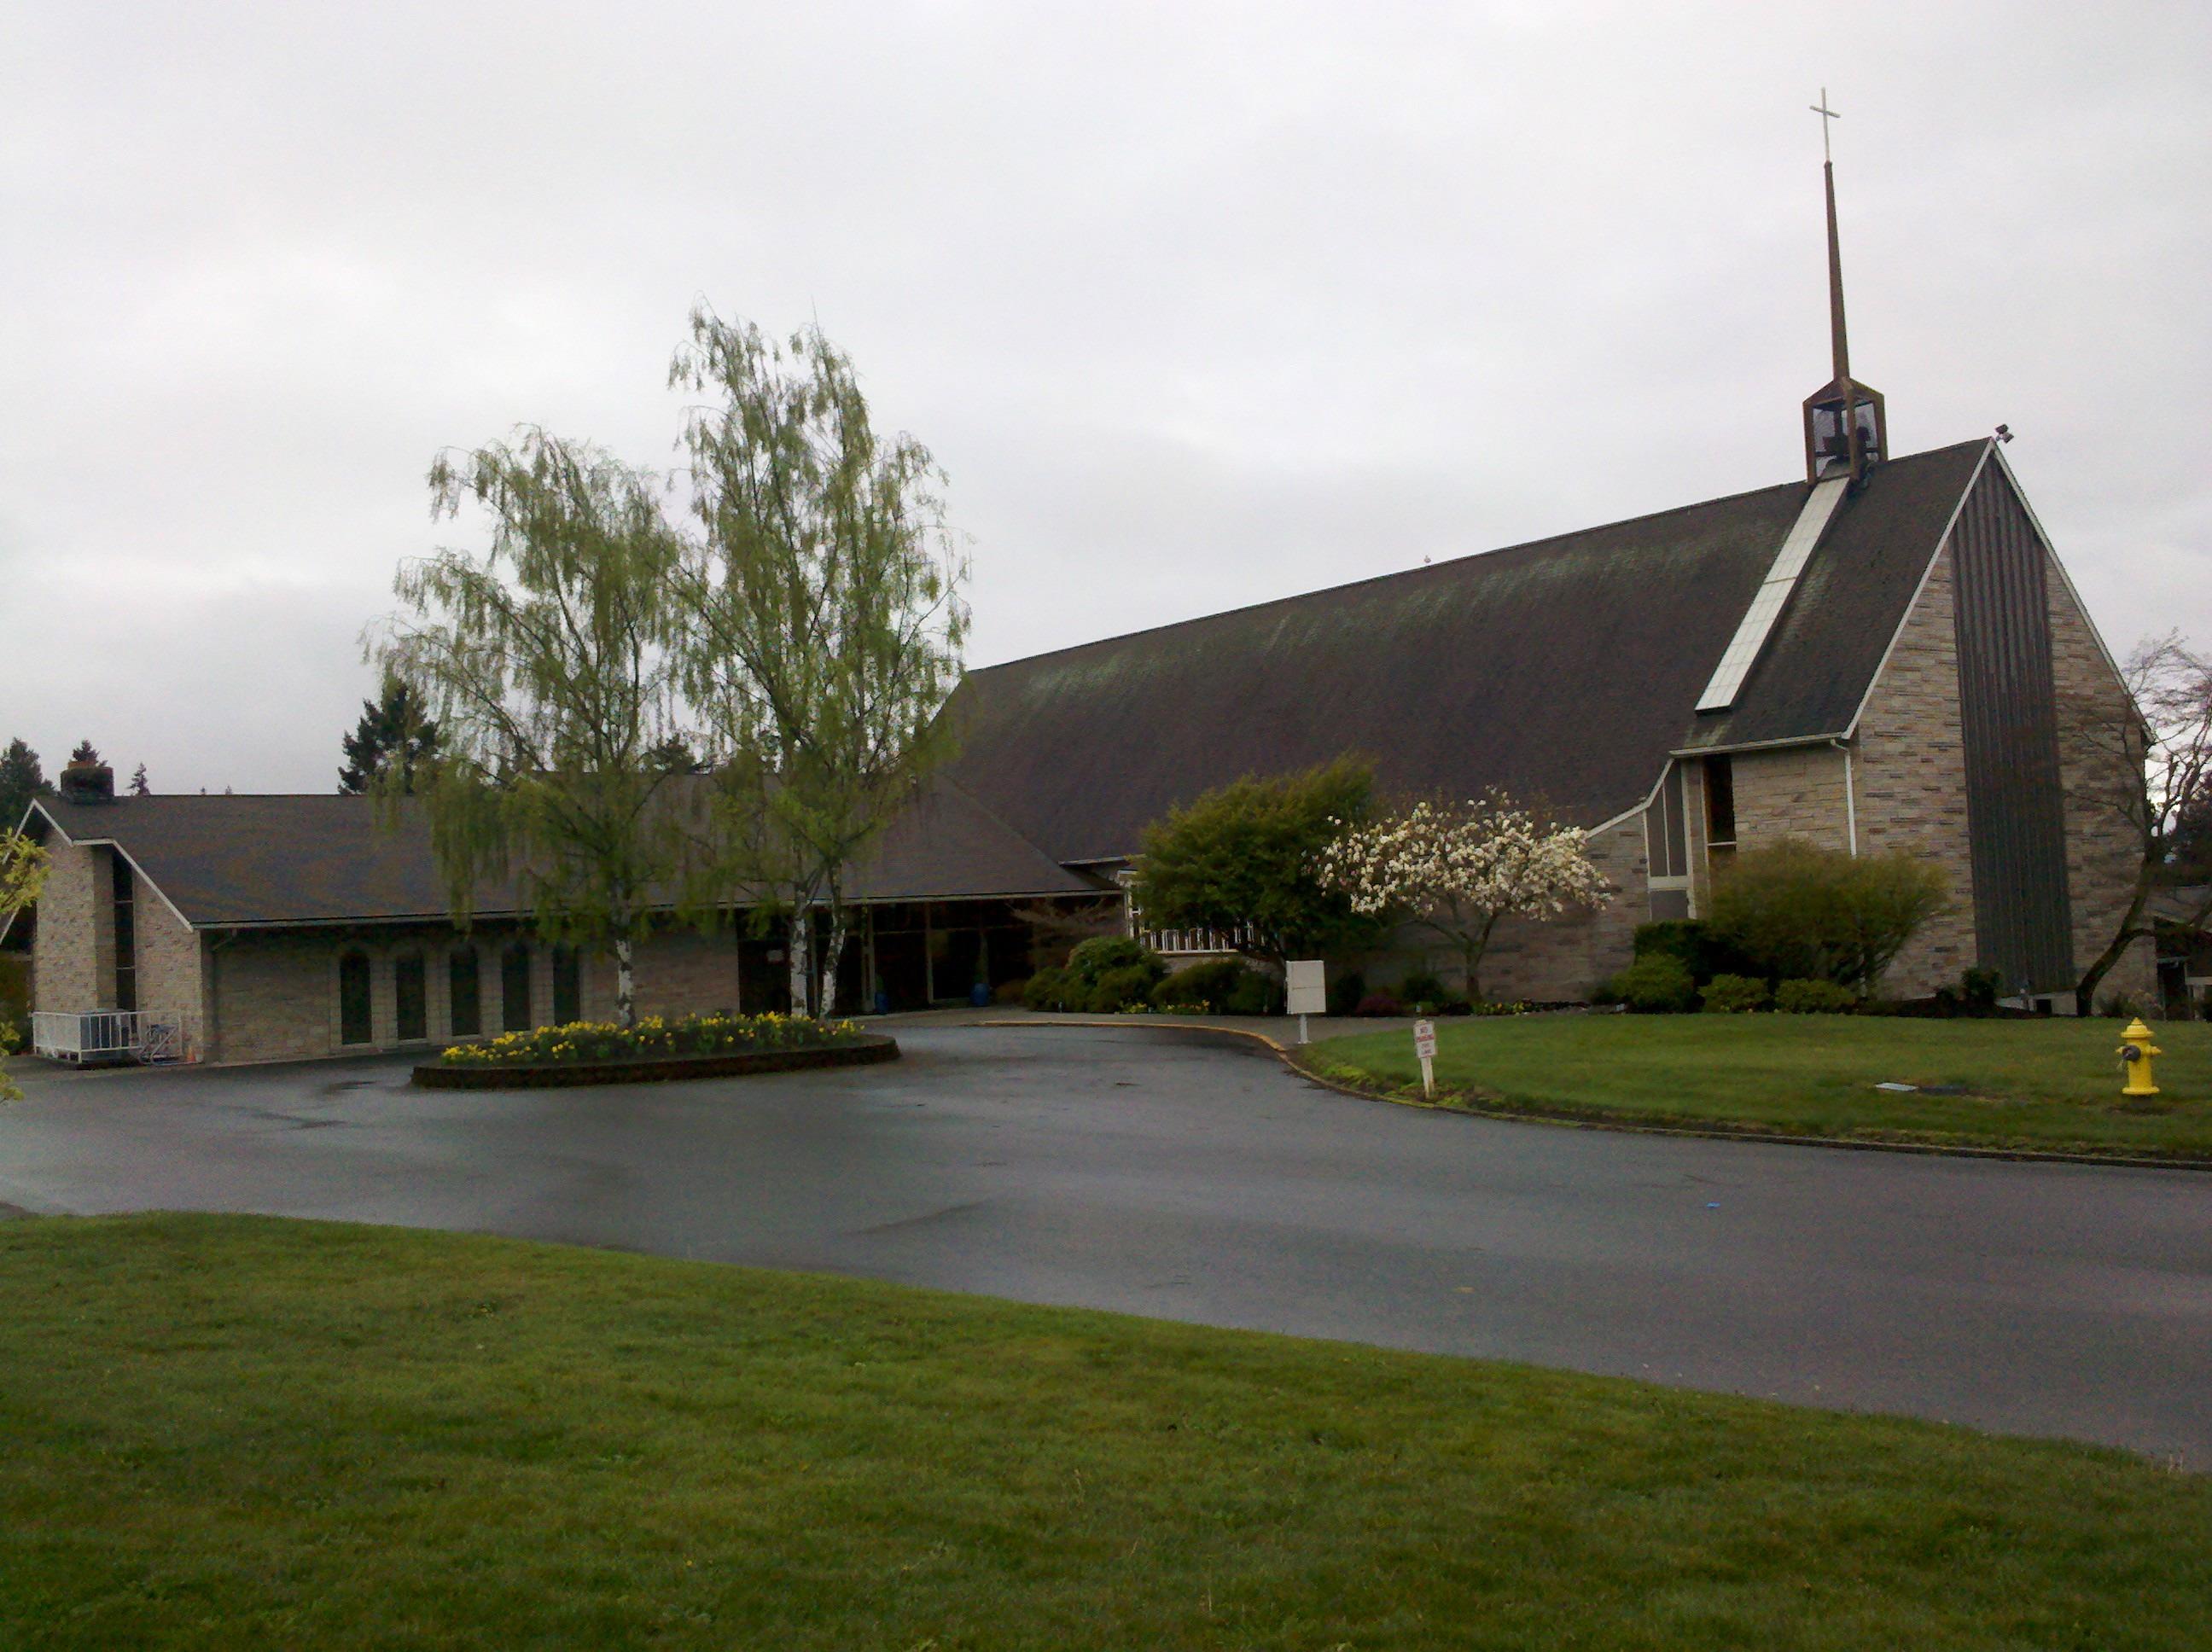 Edmonds United Methodist Church (Photo by Eric Brotman)